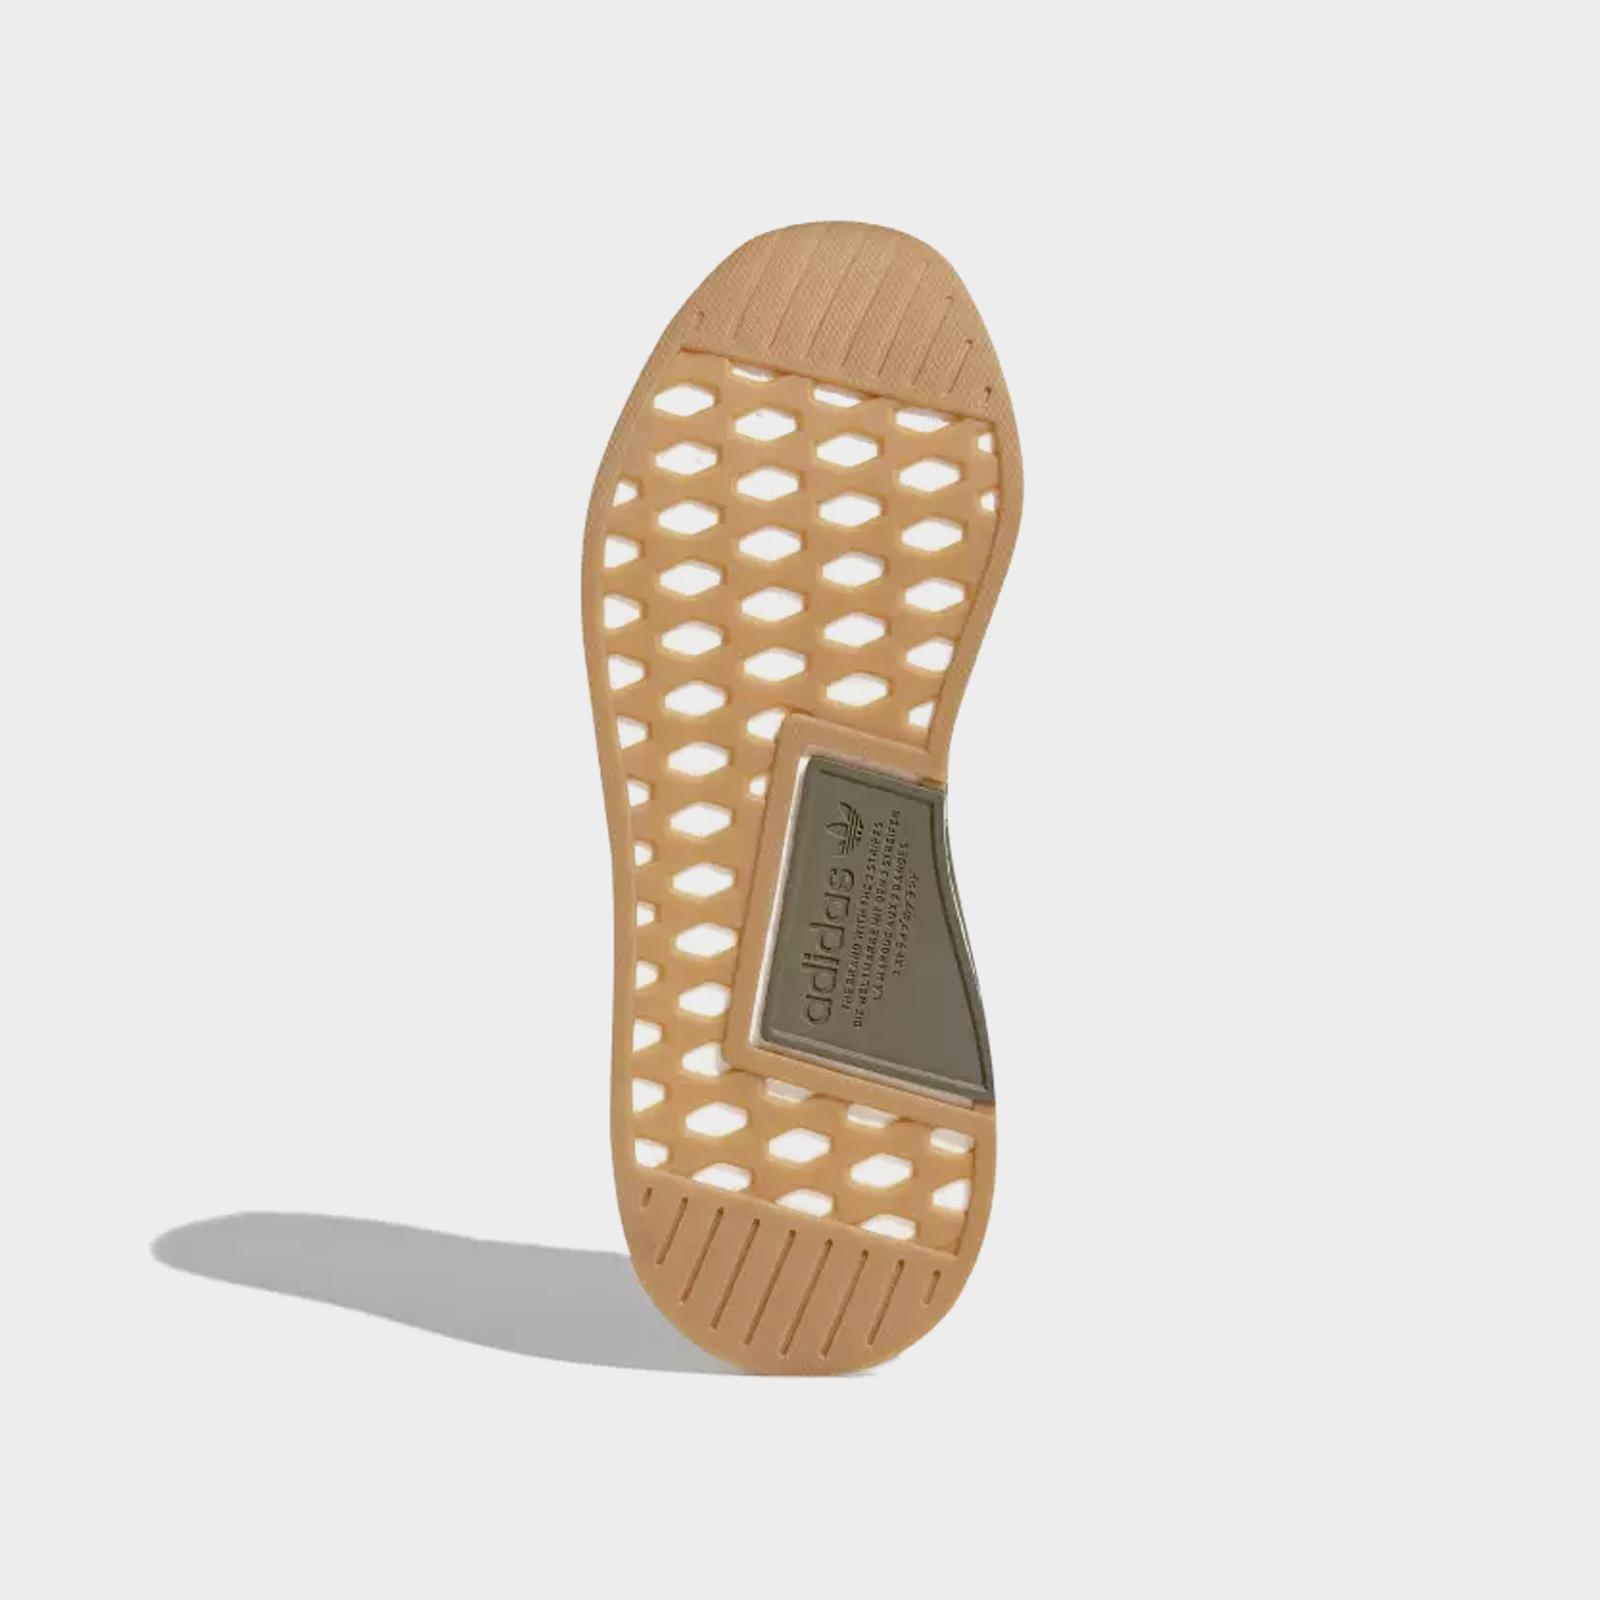 b22d1033ccd5a adidas NMD R2 - Cq2399 - Sneakersnstuff